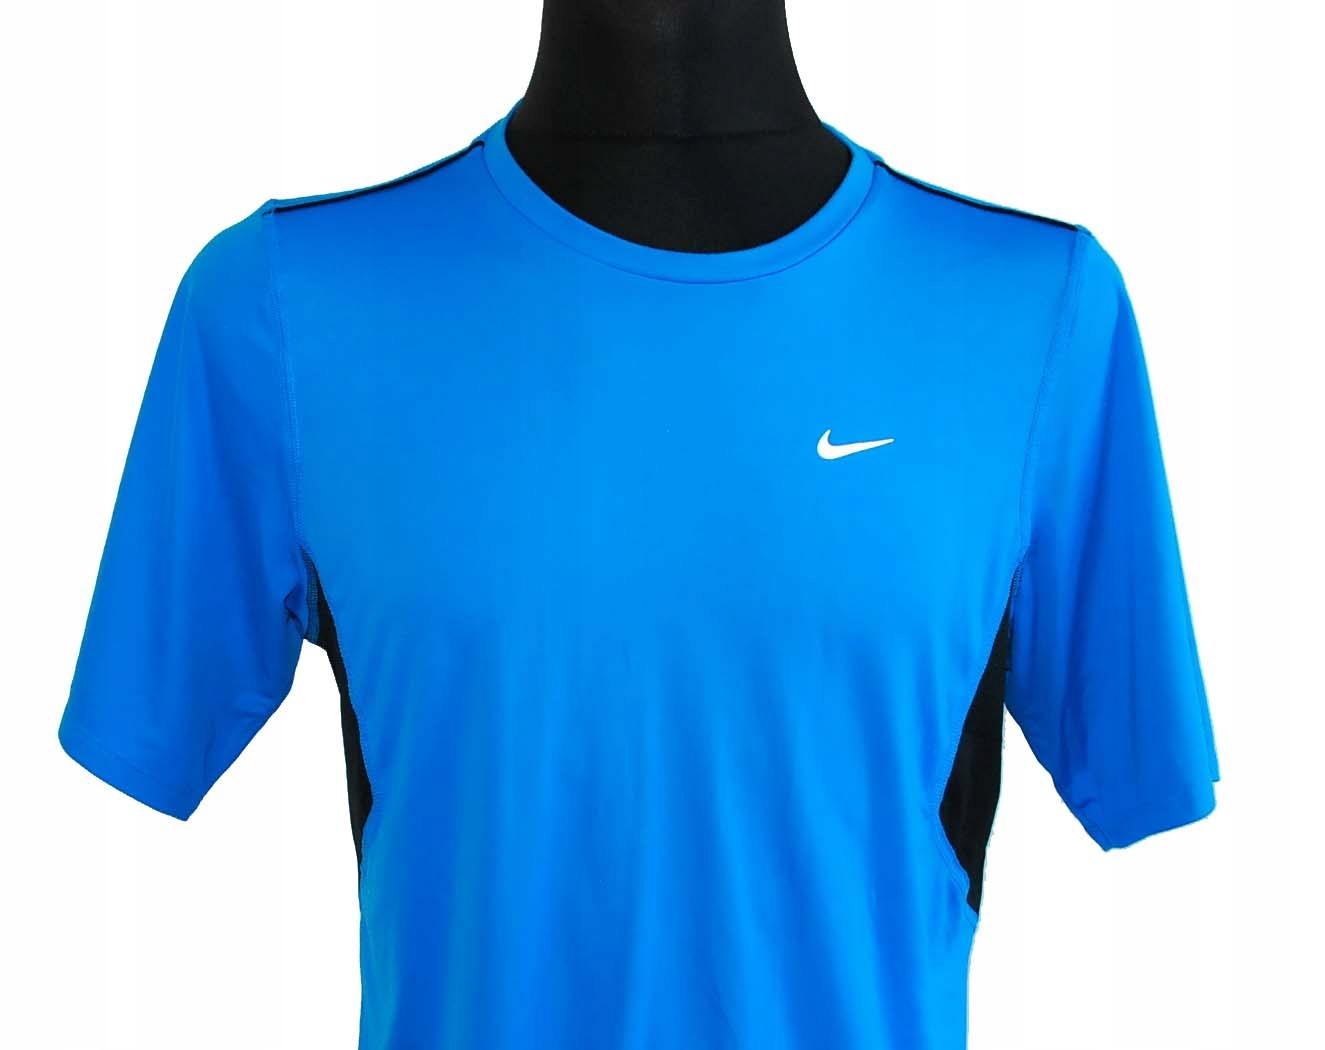 NIKE DRI-FIT running oryginalna koszulka sportowa